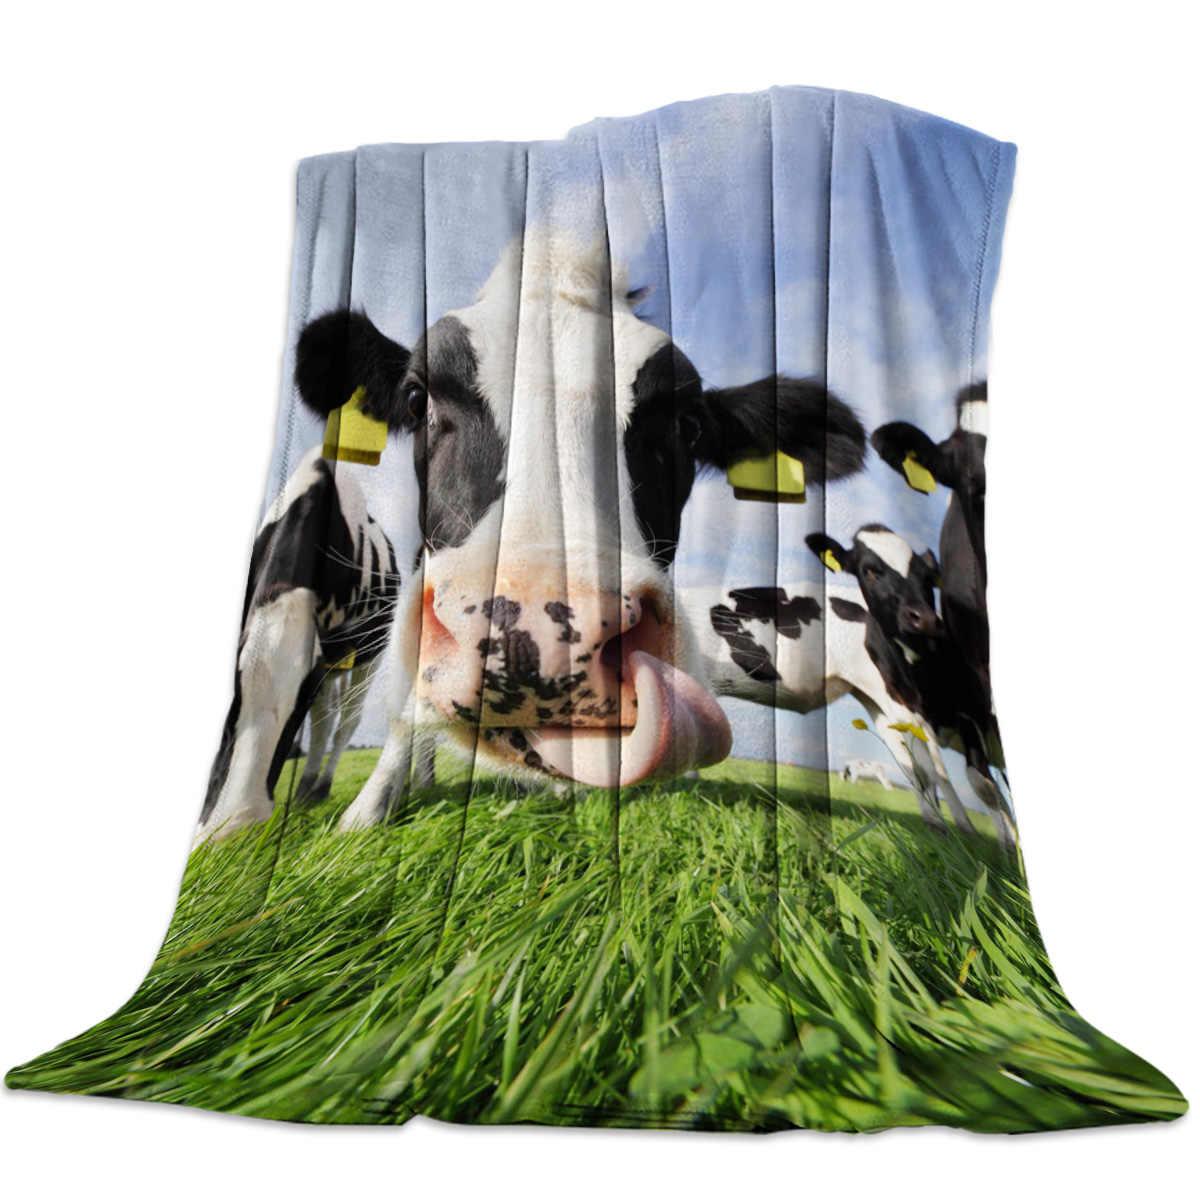 Sapi Biru Langit Awan Putih Prairie Peternakan Peternakan Indah Karang Bulu Fuzzy Selimut Di Tempat Tidur Kain Penutup Selimut Bedsheet untuk Anak-anak Gadis